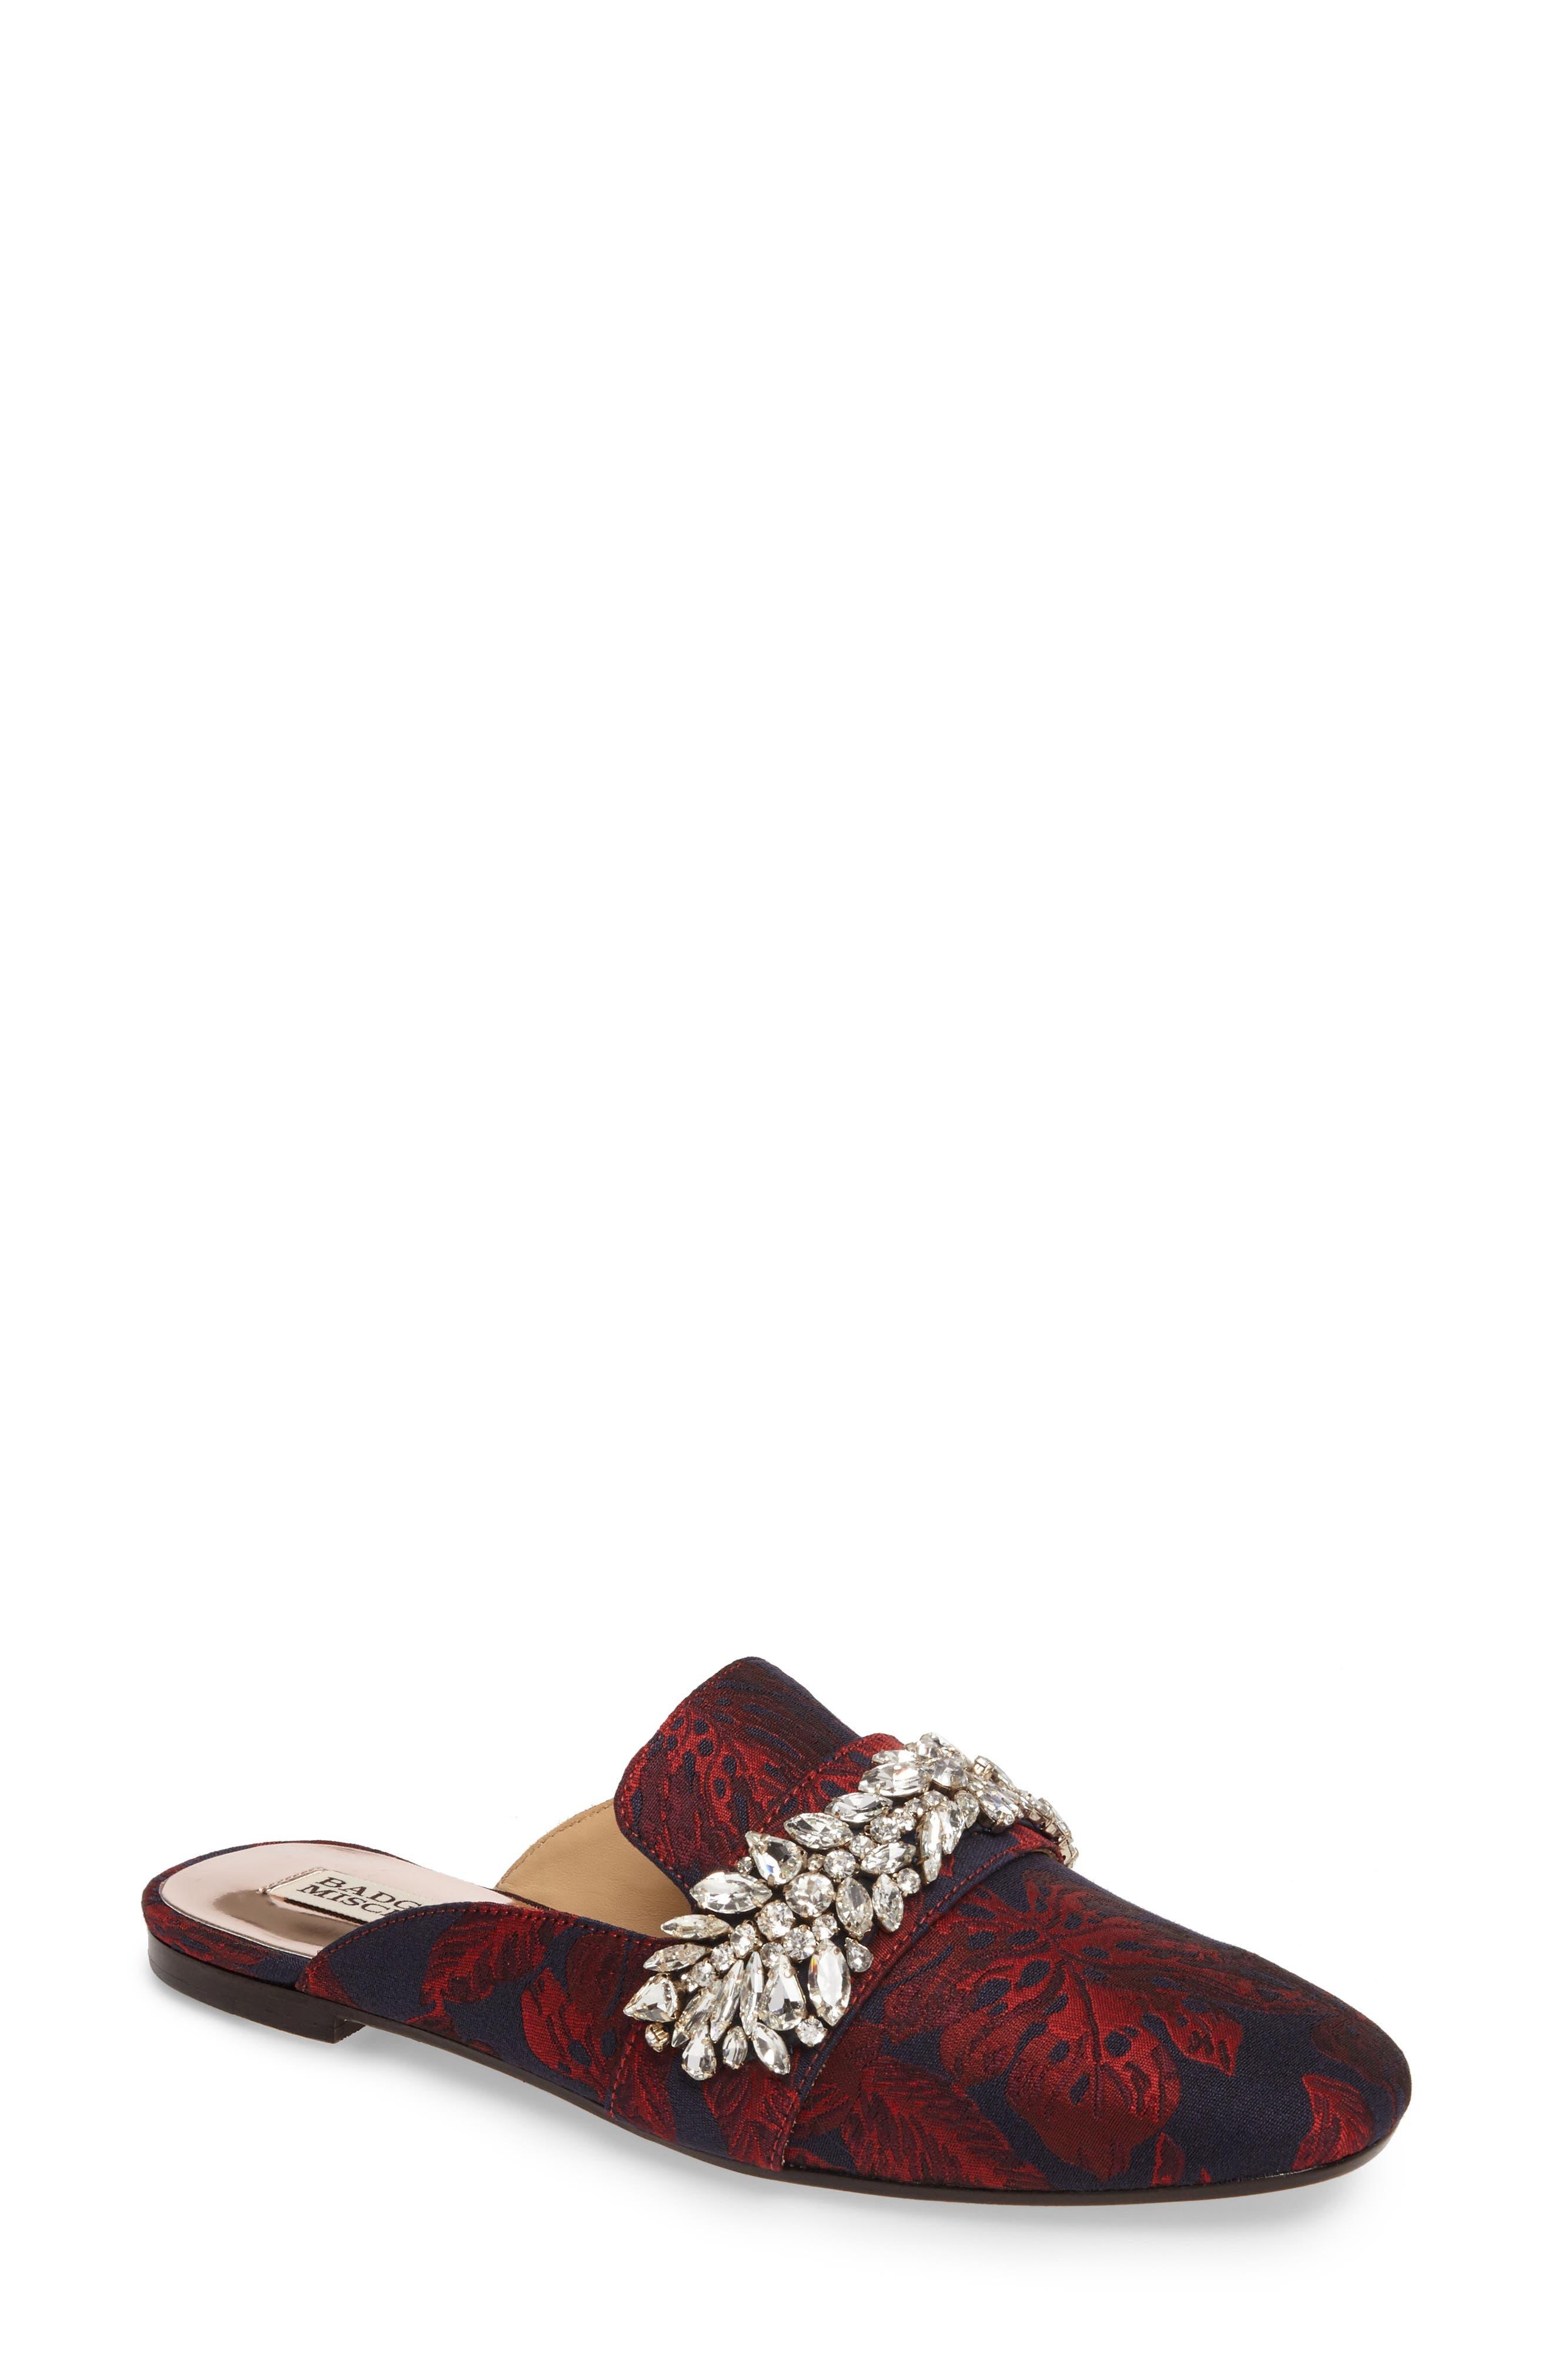 Badgley Mischka Kana Embellished Loafer Mule (Women)